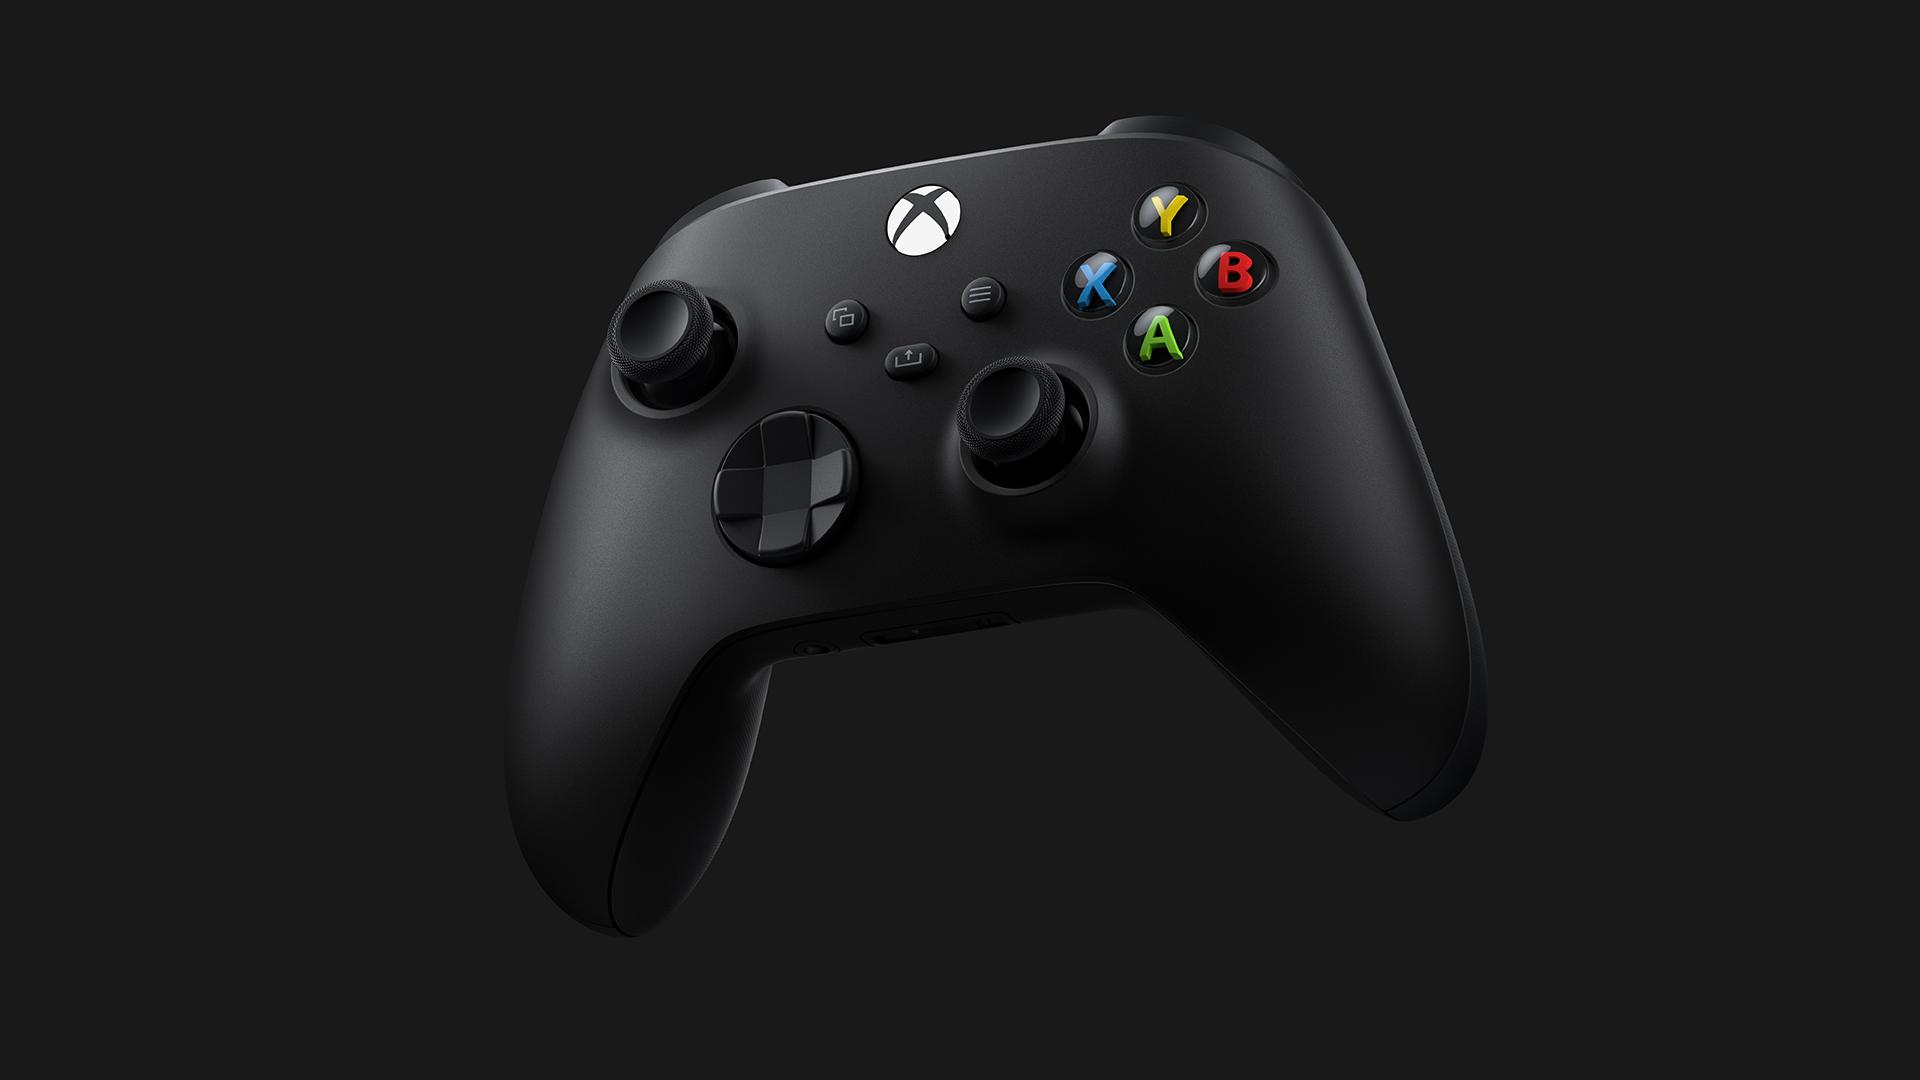 Xbox Series X Controller image